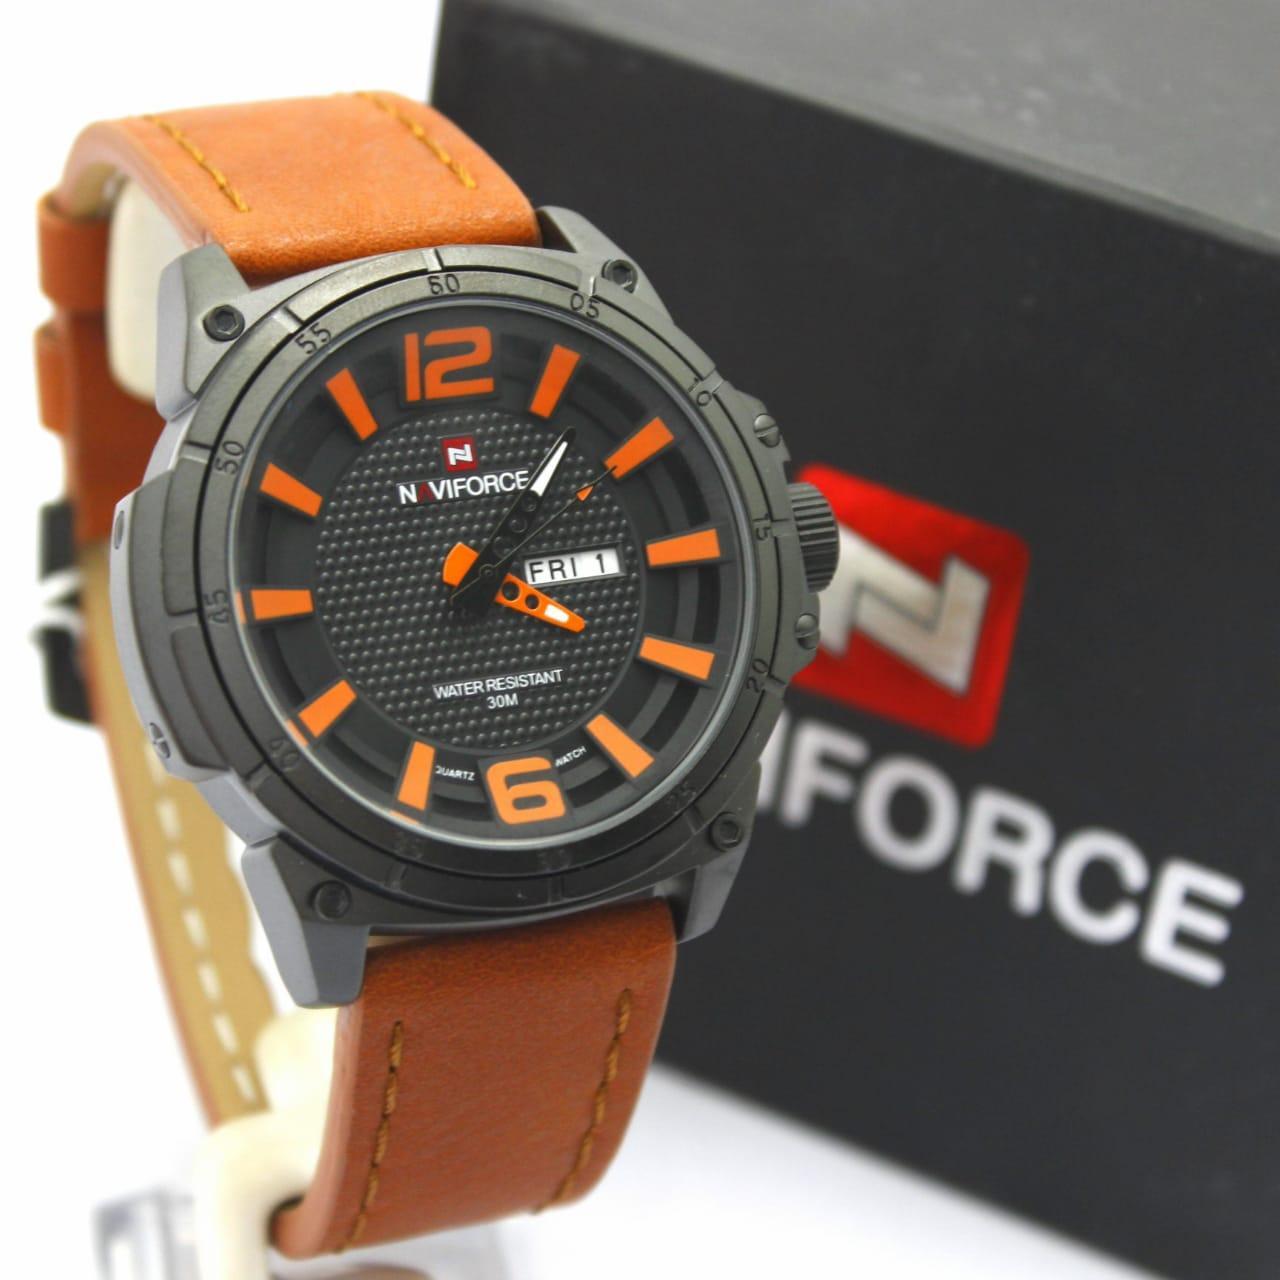 D Force Jam Tangan Pria Strap Combinasi Stainless Steel Hitam Chronoforce 5228mb Merah Navi 9066 Art